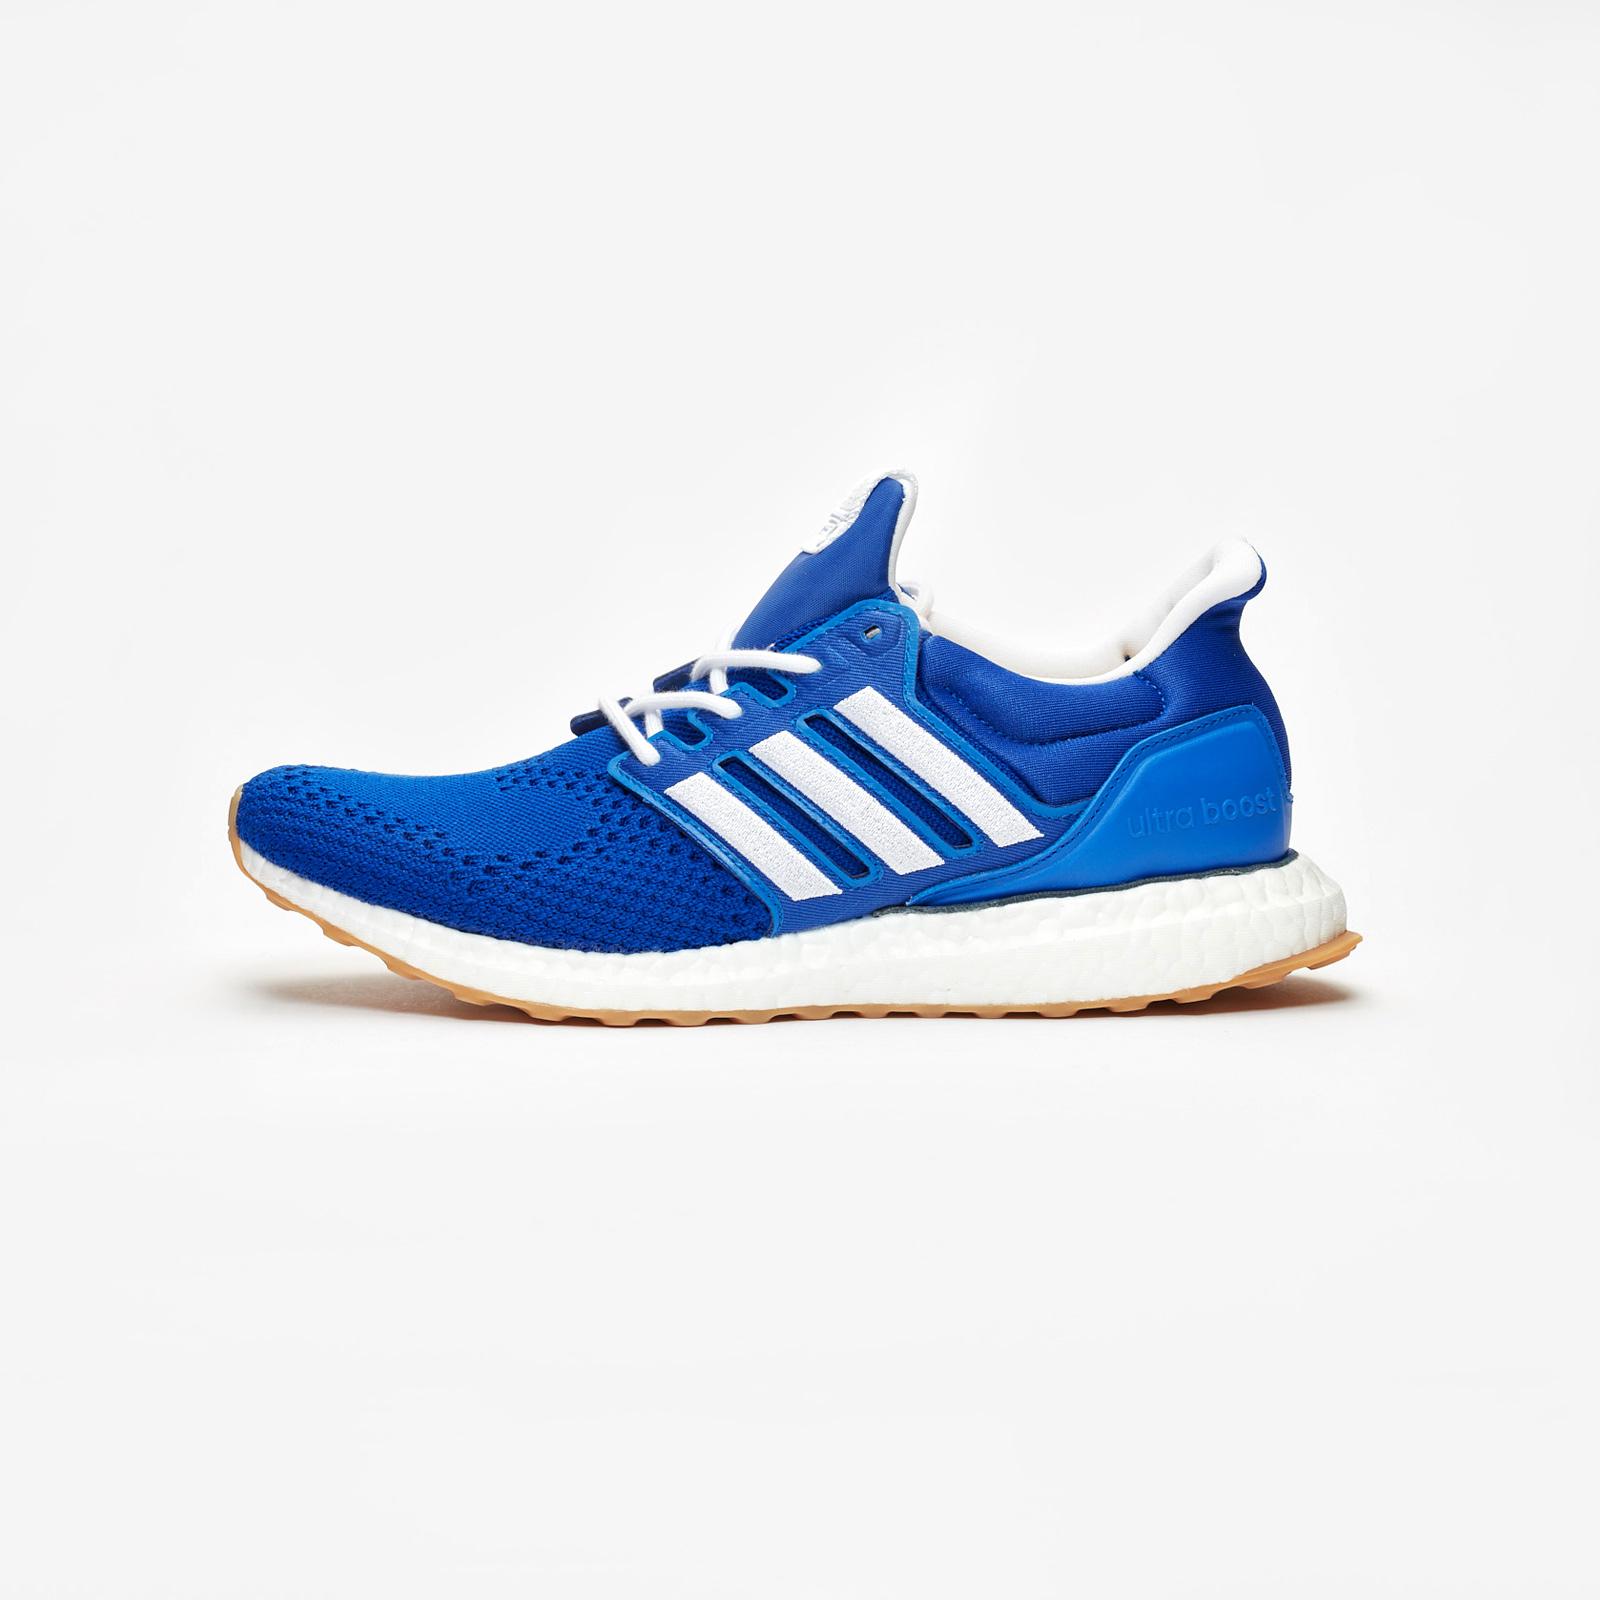 new arrivals 6c57d df173 adidas UltraBOOST E.G - Bc0949 - Sneakersnstuff   sneakers   streetwear  online since 1999